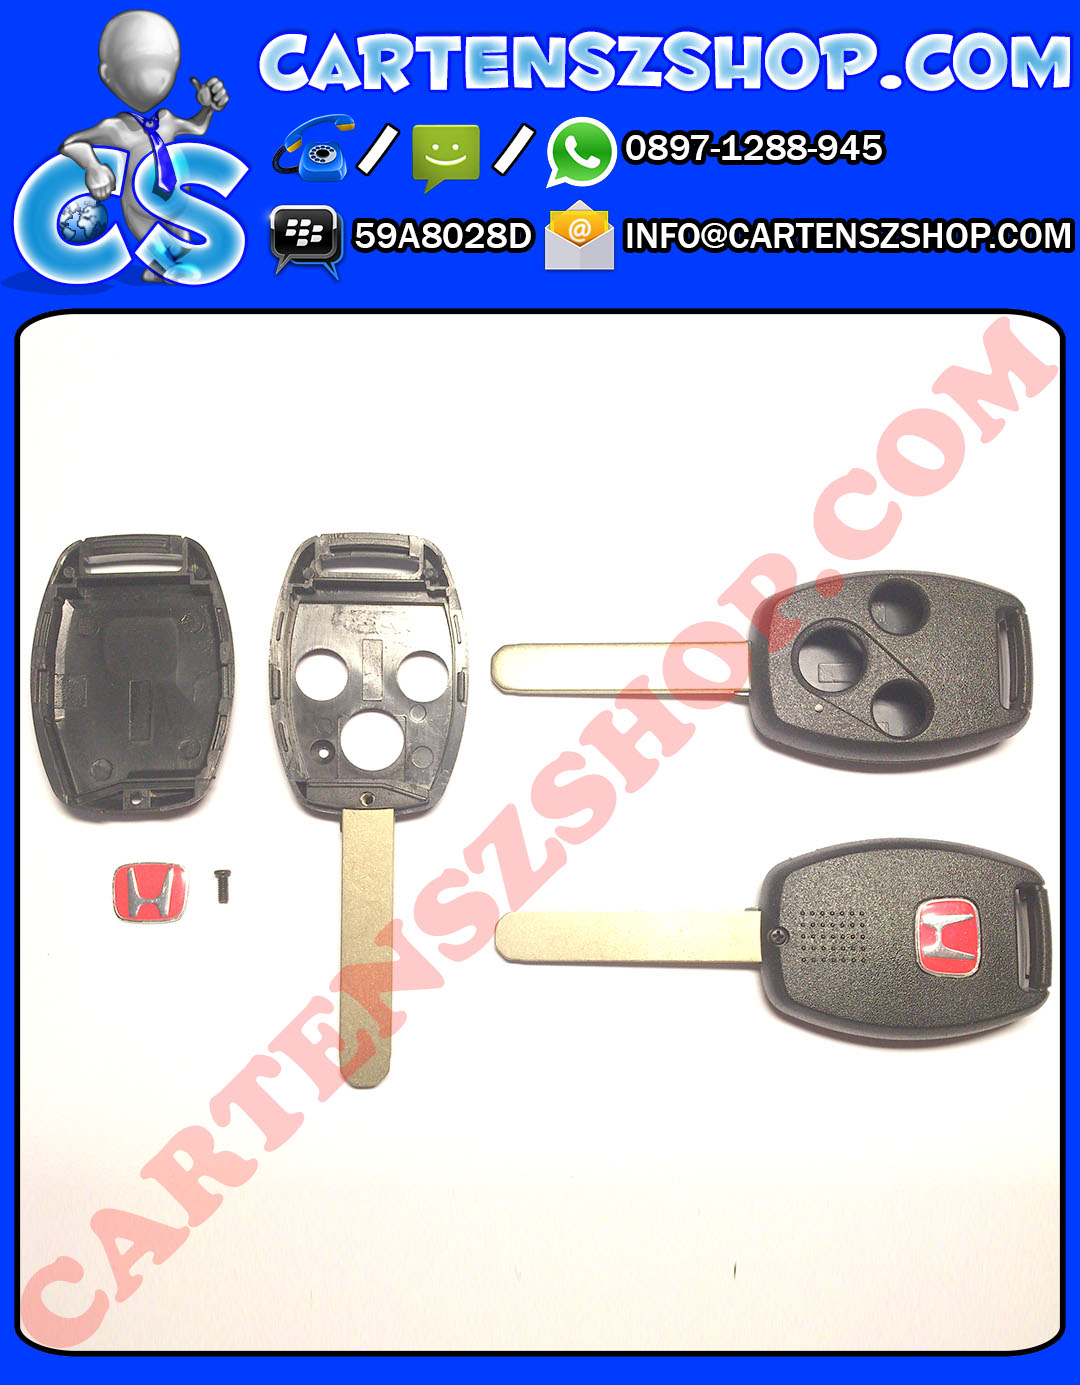 Casing Kunci Model Standar 3 Tombol Emblem Merah Mobil Honda Jazz CRV Civic